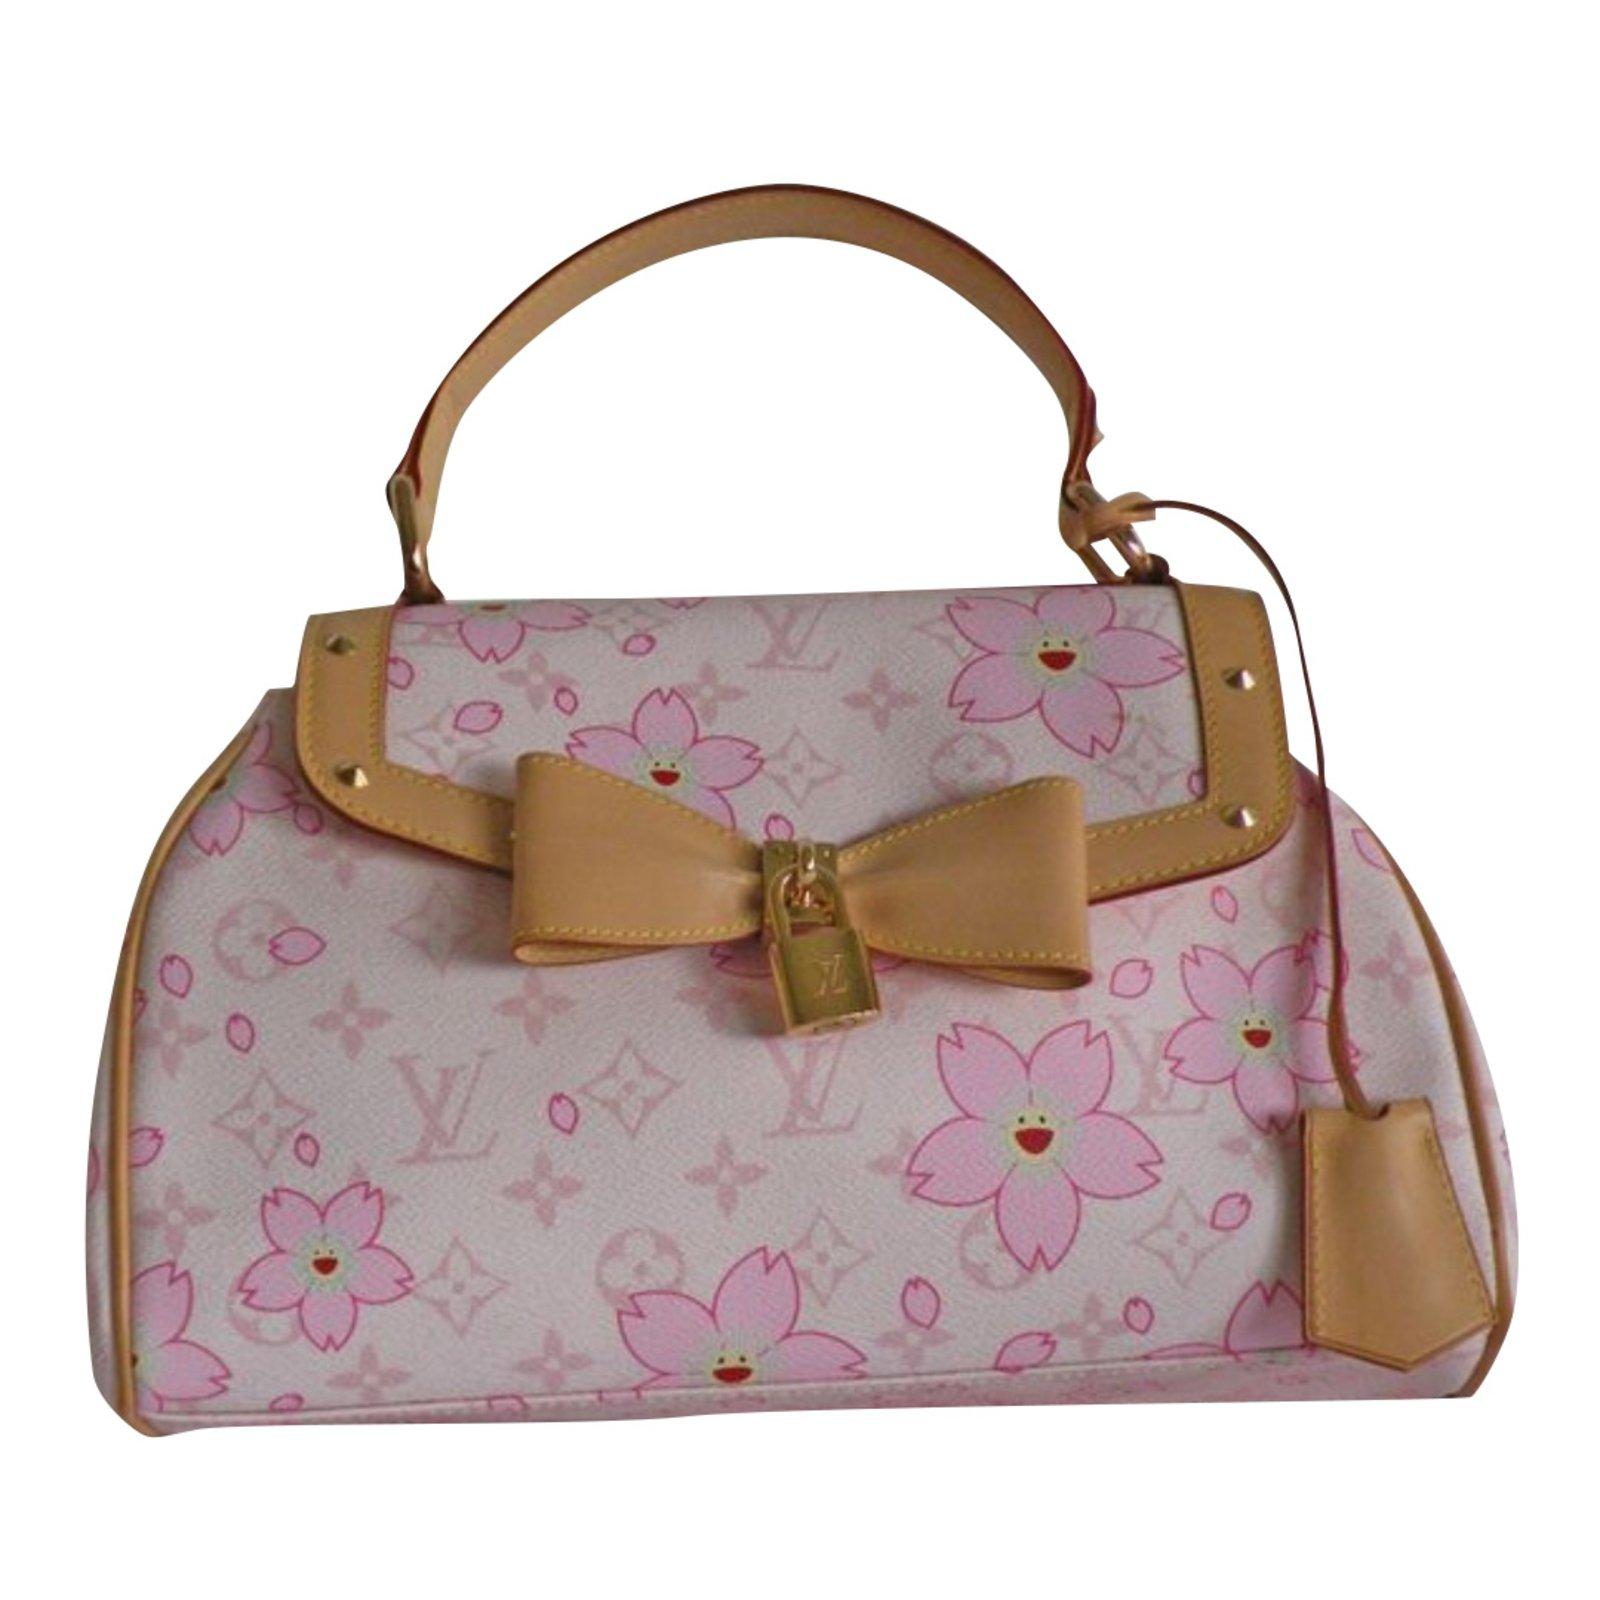 2f25c845ae Louis Vuitton Retro Cherry Blossom Takashi Murakami Handbags Leather